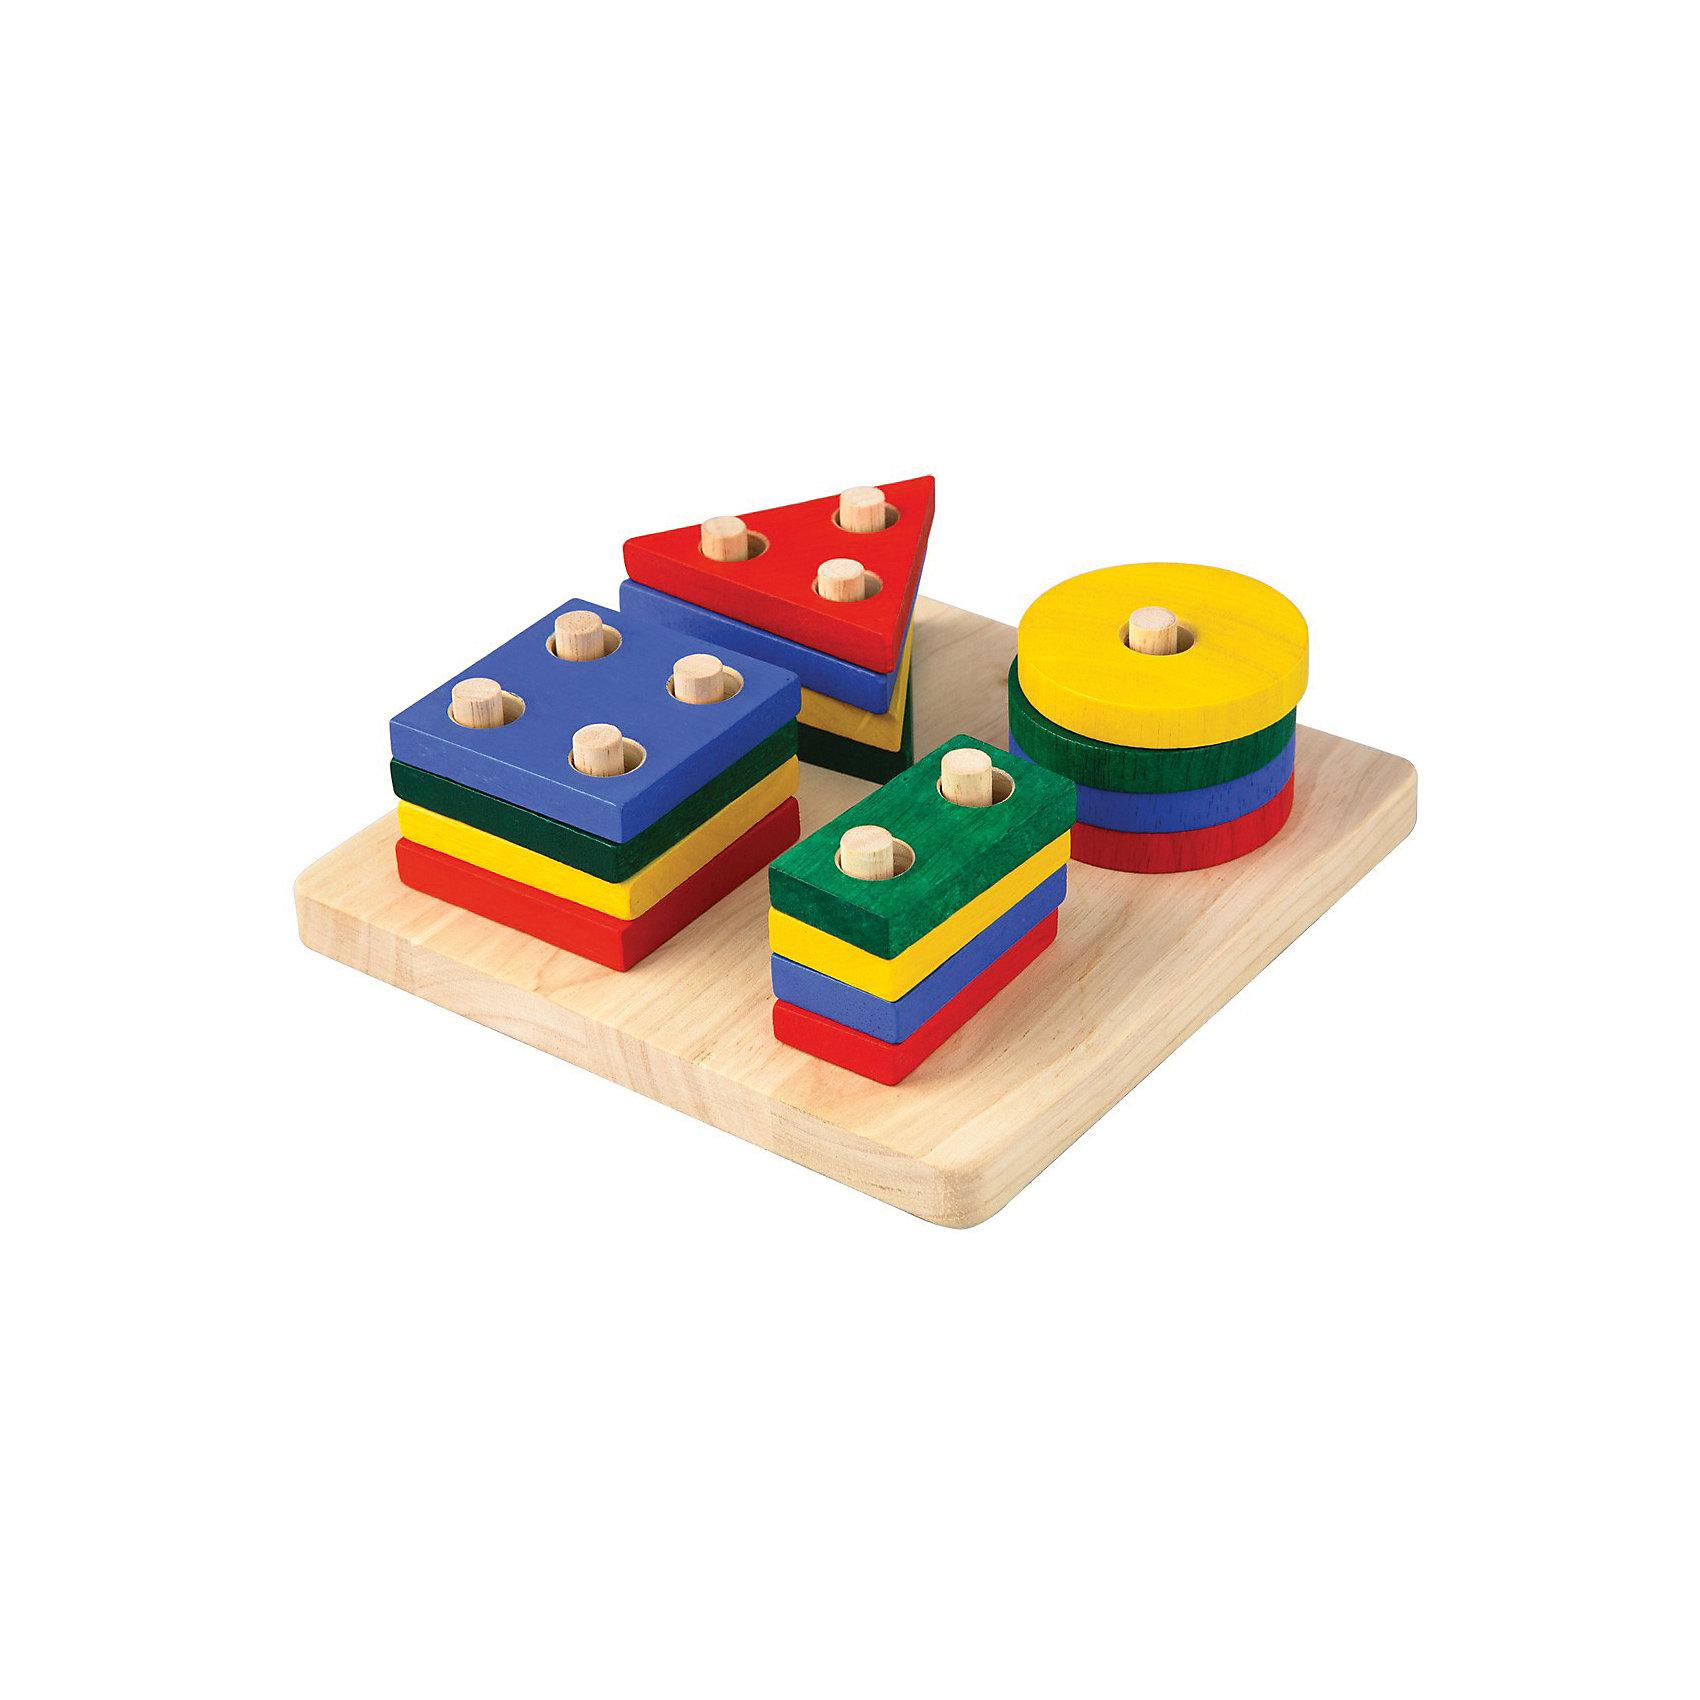 Plan Toys Сортер Доска с геометрическими фигурами, Plan Toys plan toys сортер поезд